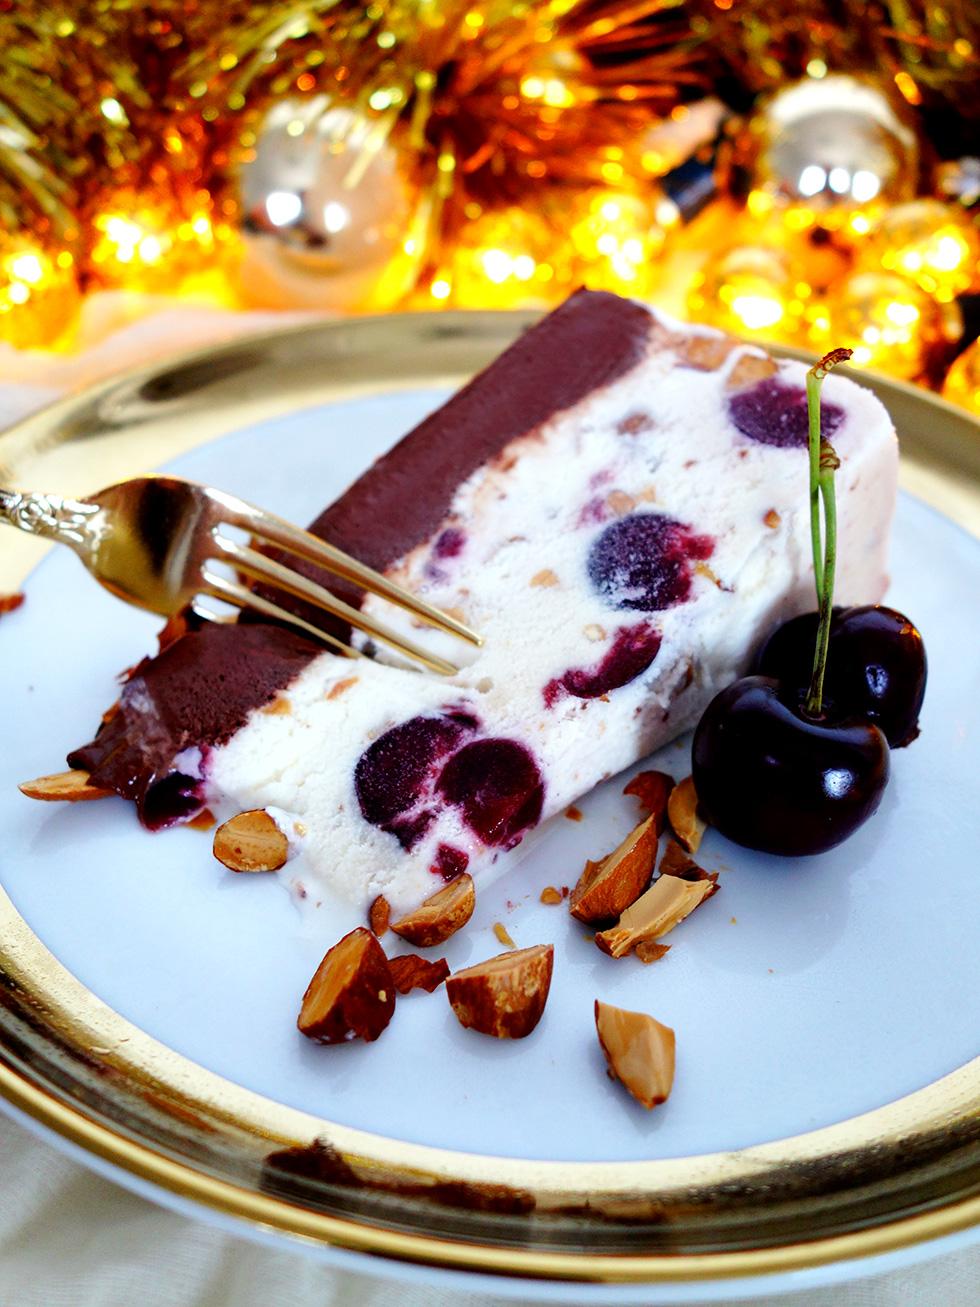 5 Ingredient Cherry Chocolate Almond Ice-Cream Christmas Cake